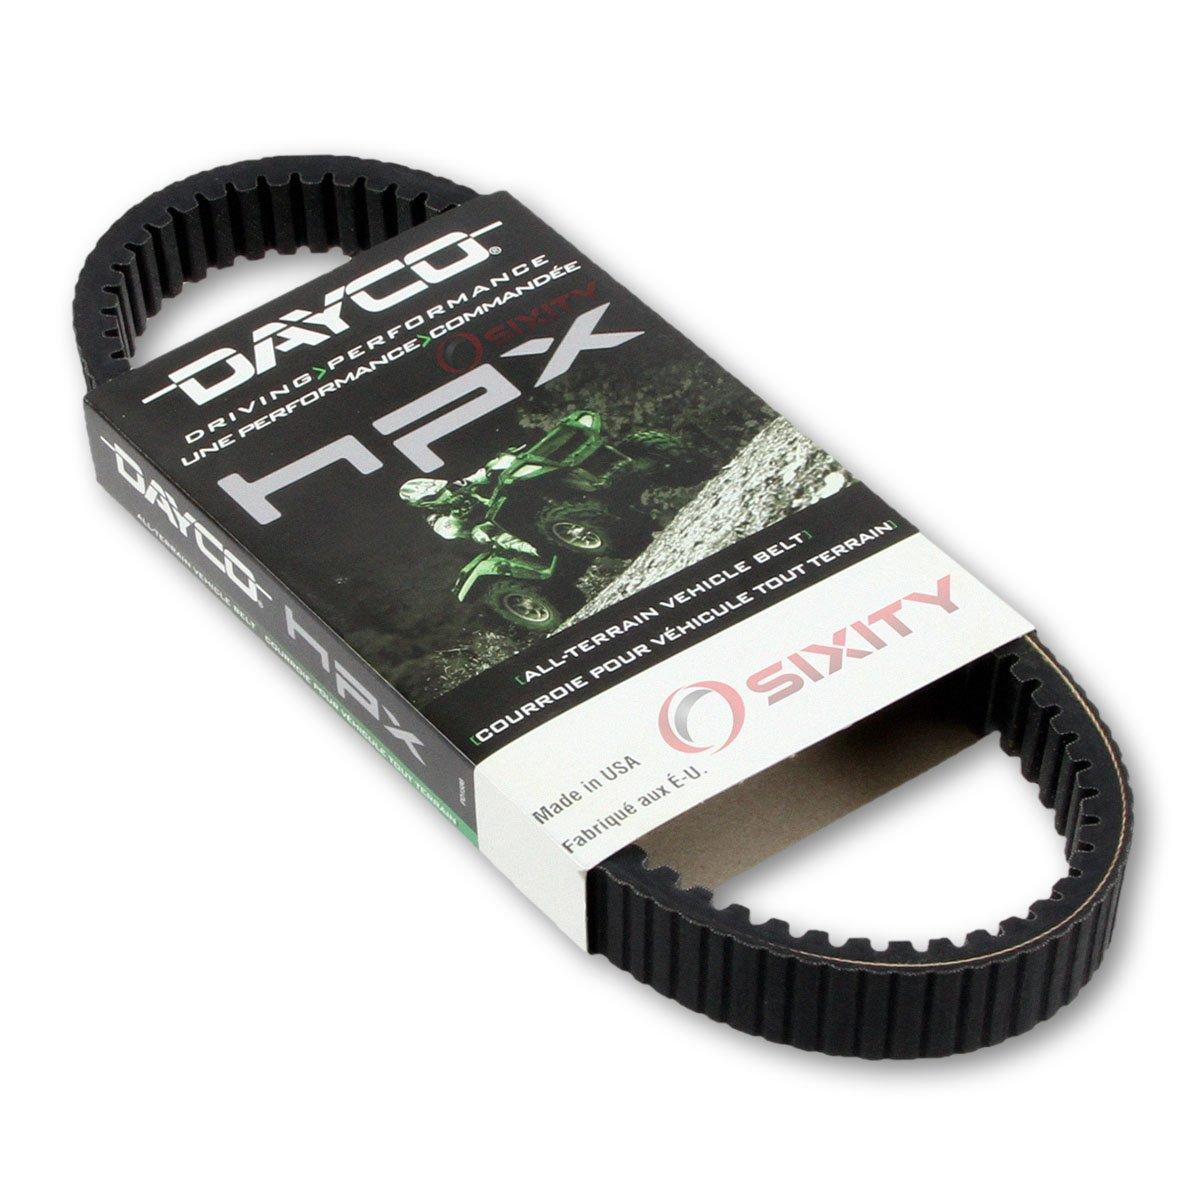 2001-2005 Polaris Sportsman 400 Drive Belt Dayco HPX W/O EBS ATV OEM Upgrade Replacement Transmission Belts